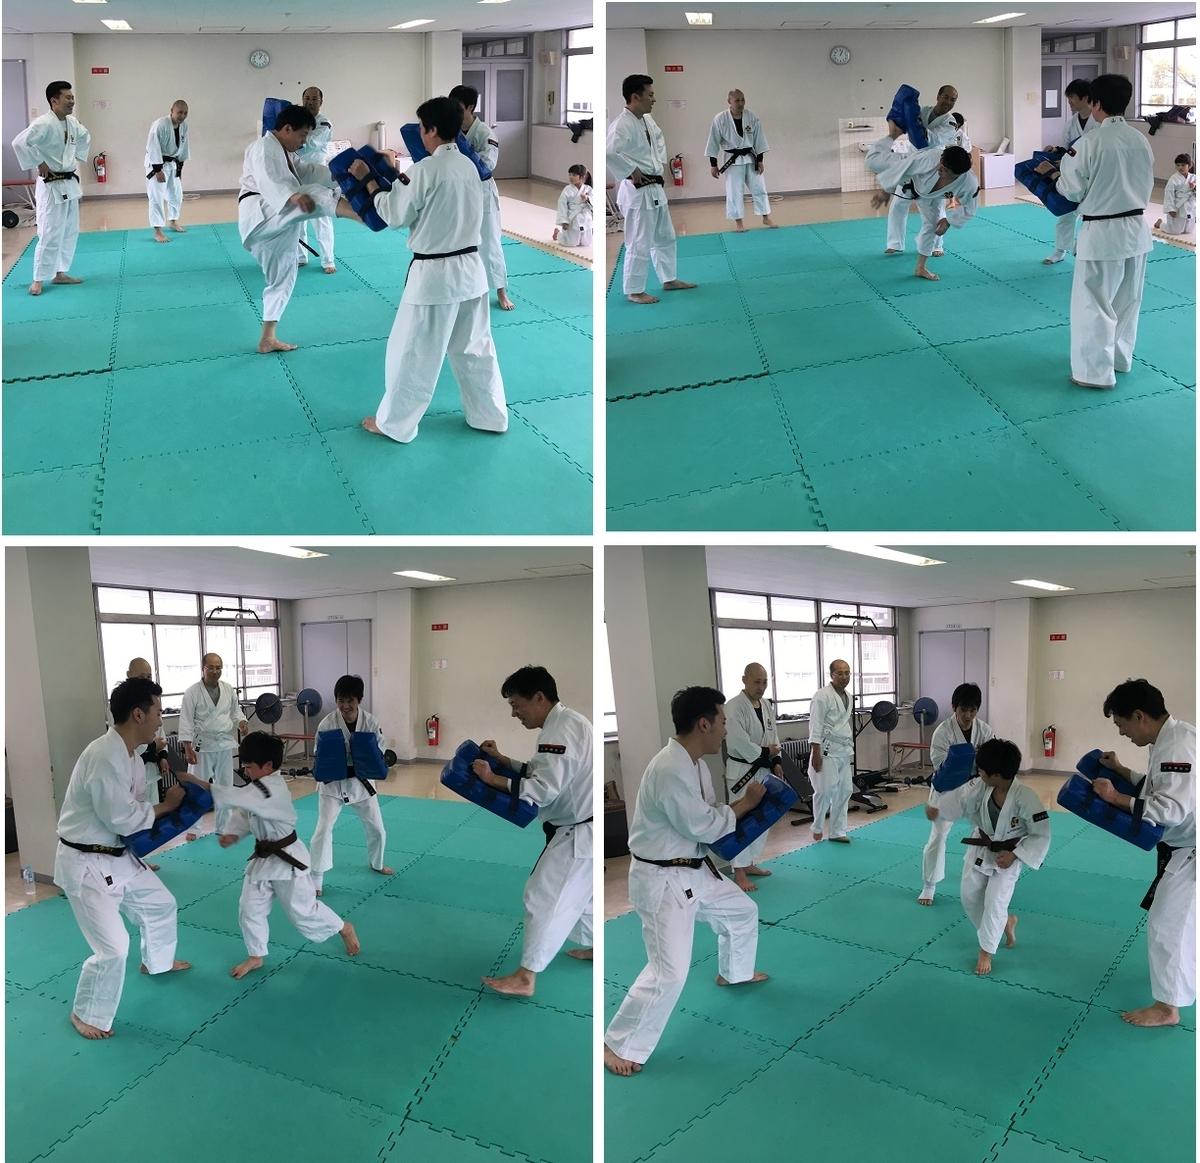 f:id:jin-good-g-martial-arts:20190422221207j:plain